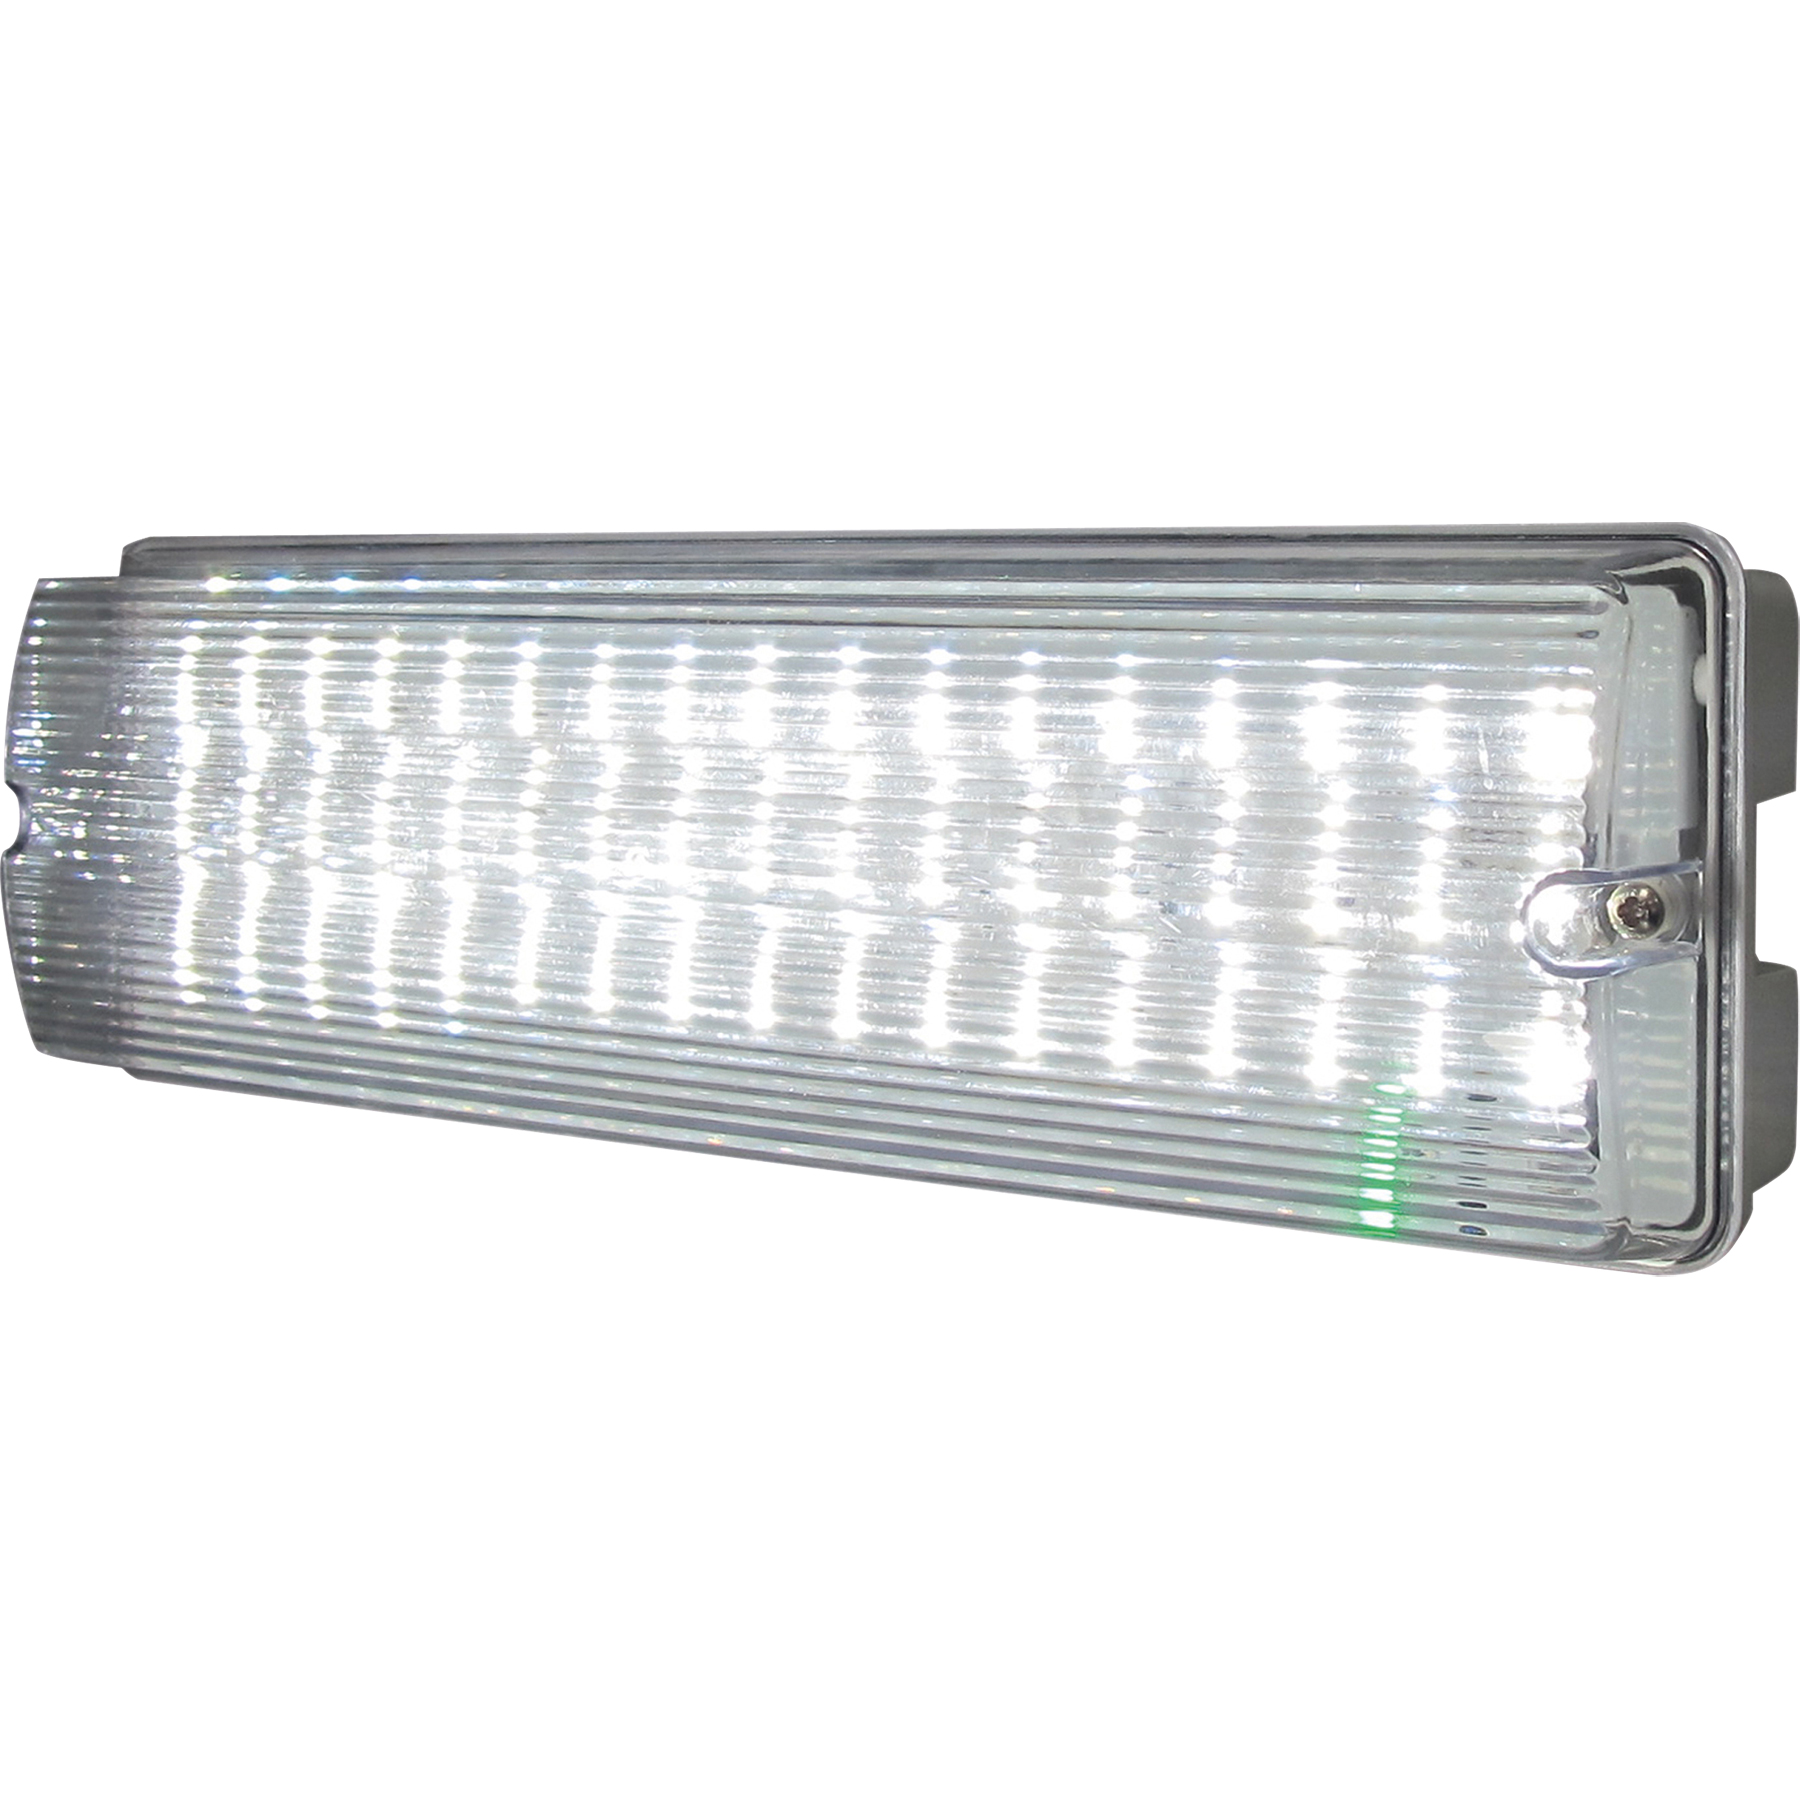 Knightsbridge emled ip w led emergency bulkhead light